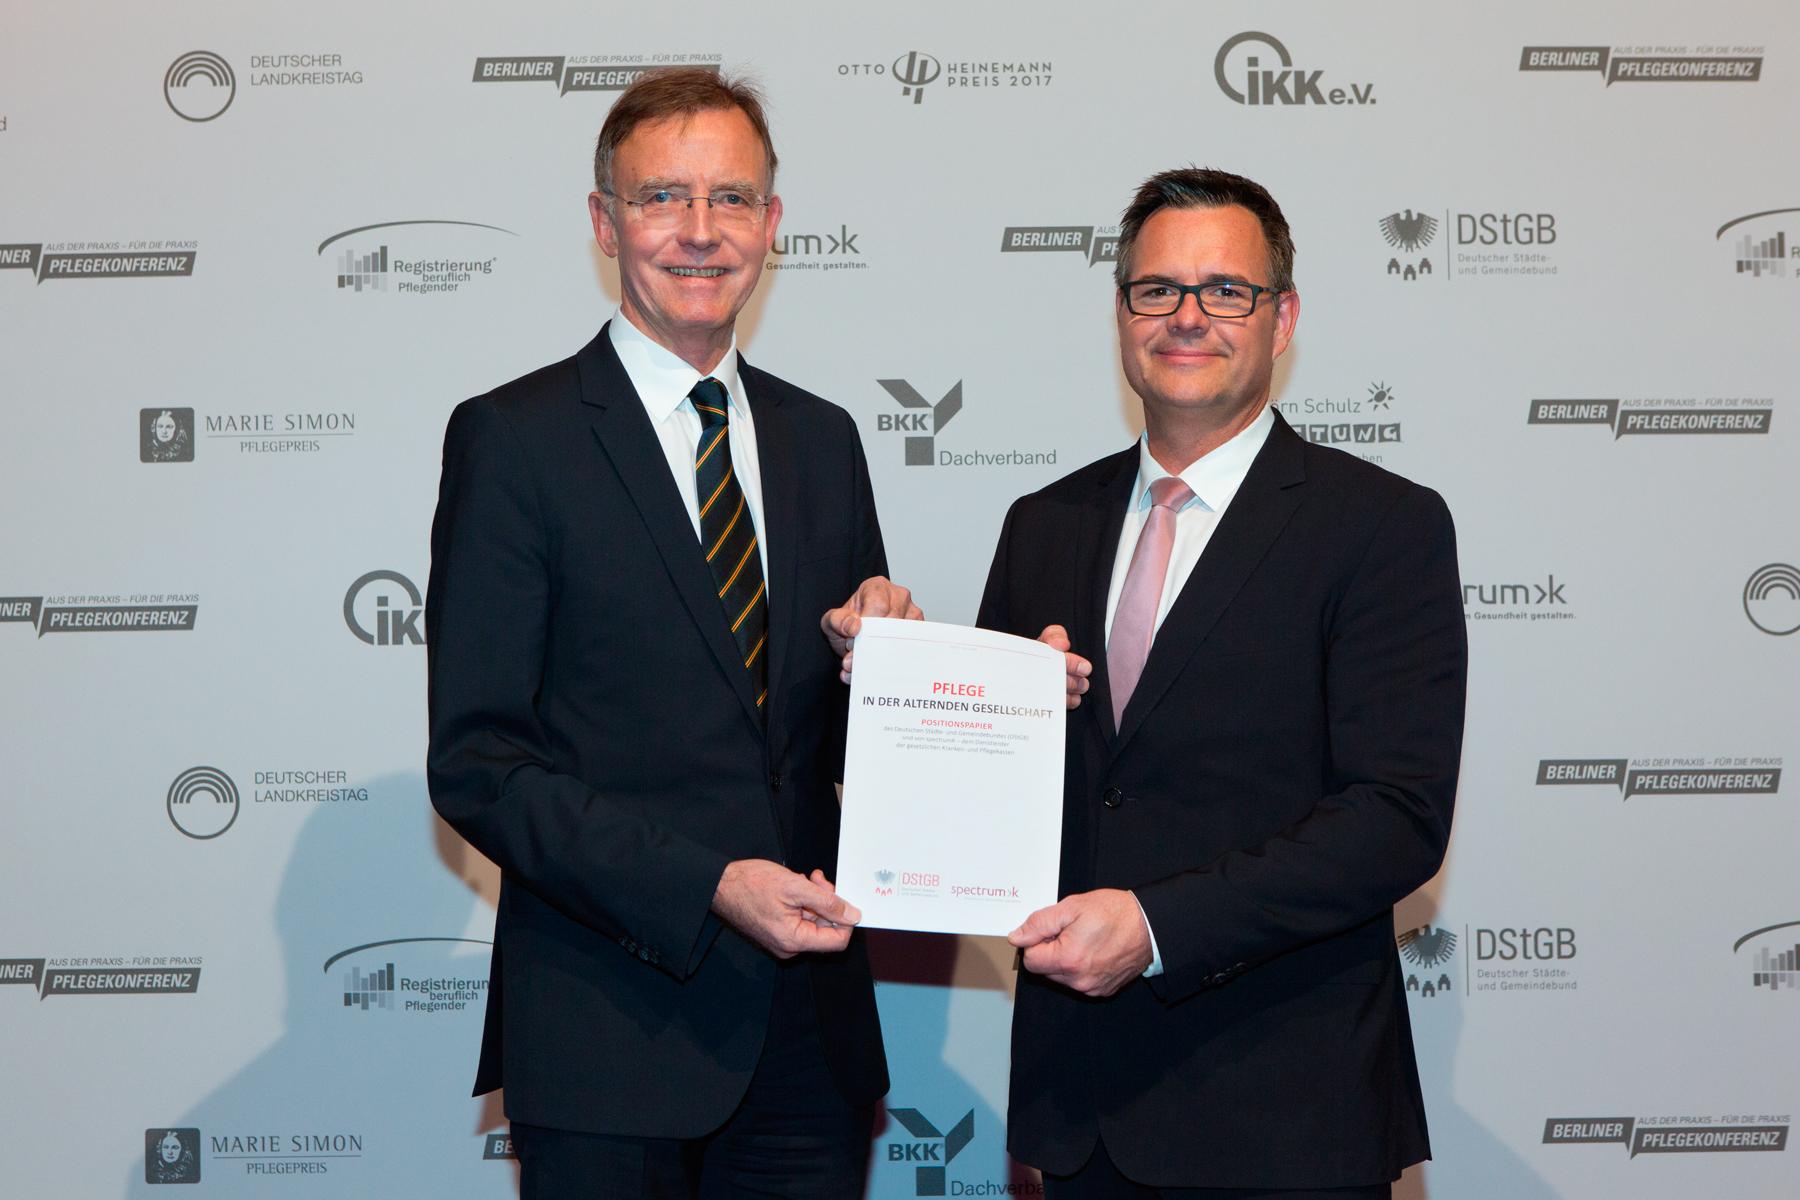 Berliner Pflegekonferenz / Allefarben-foto.com